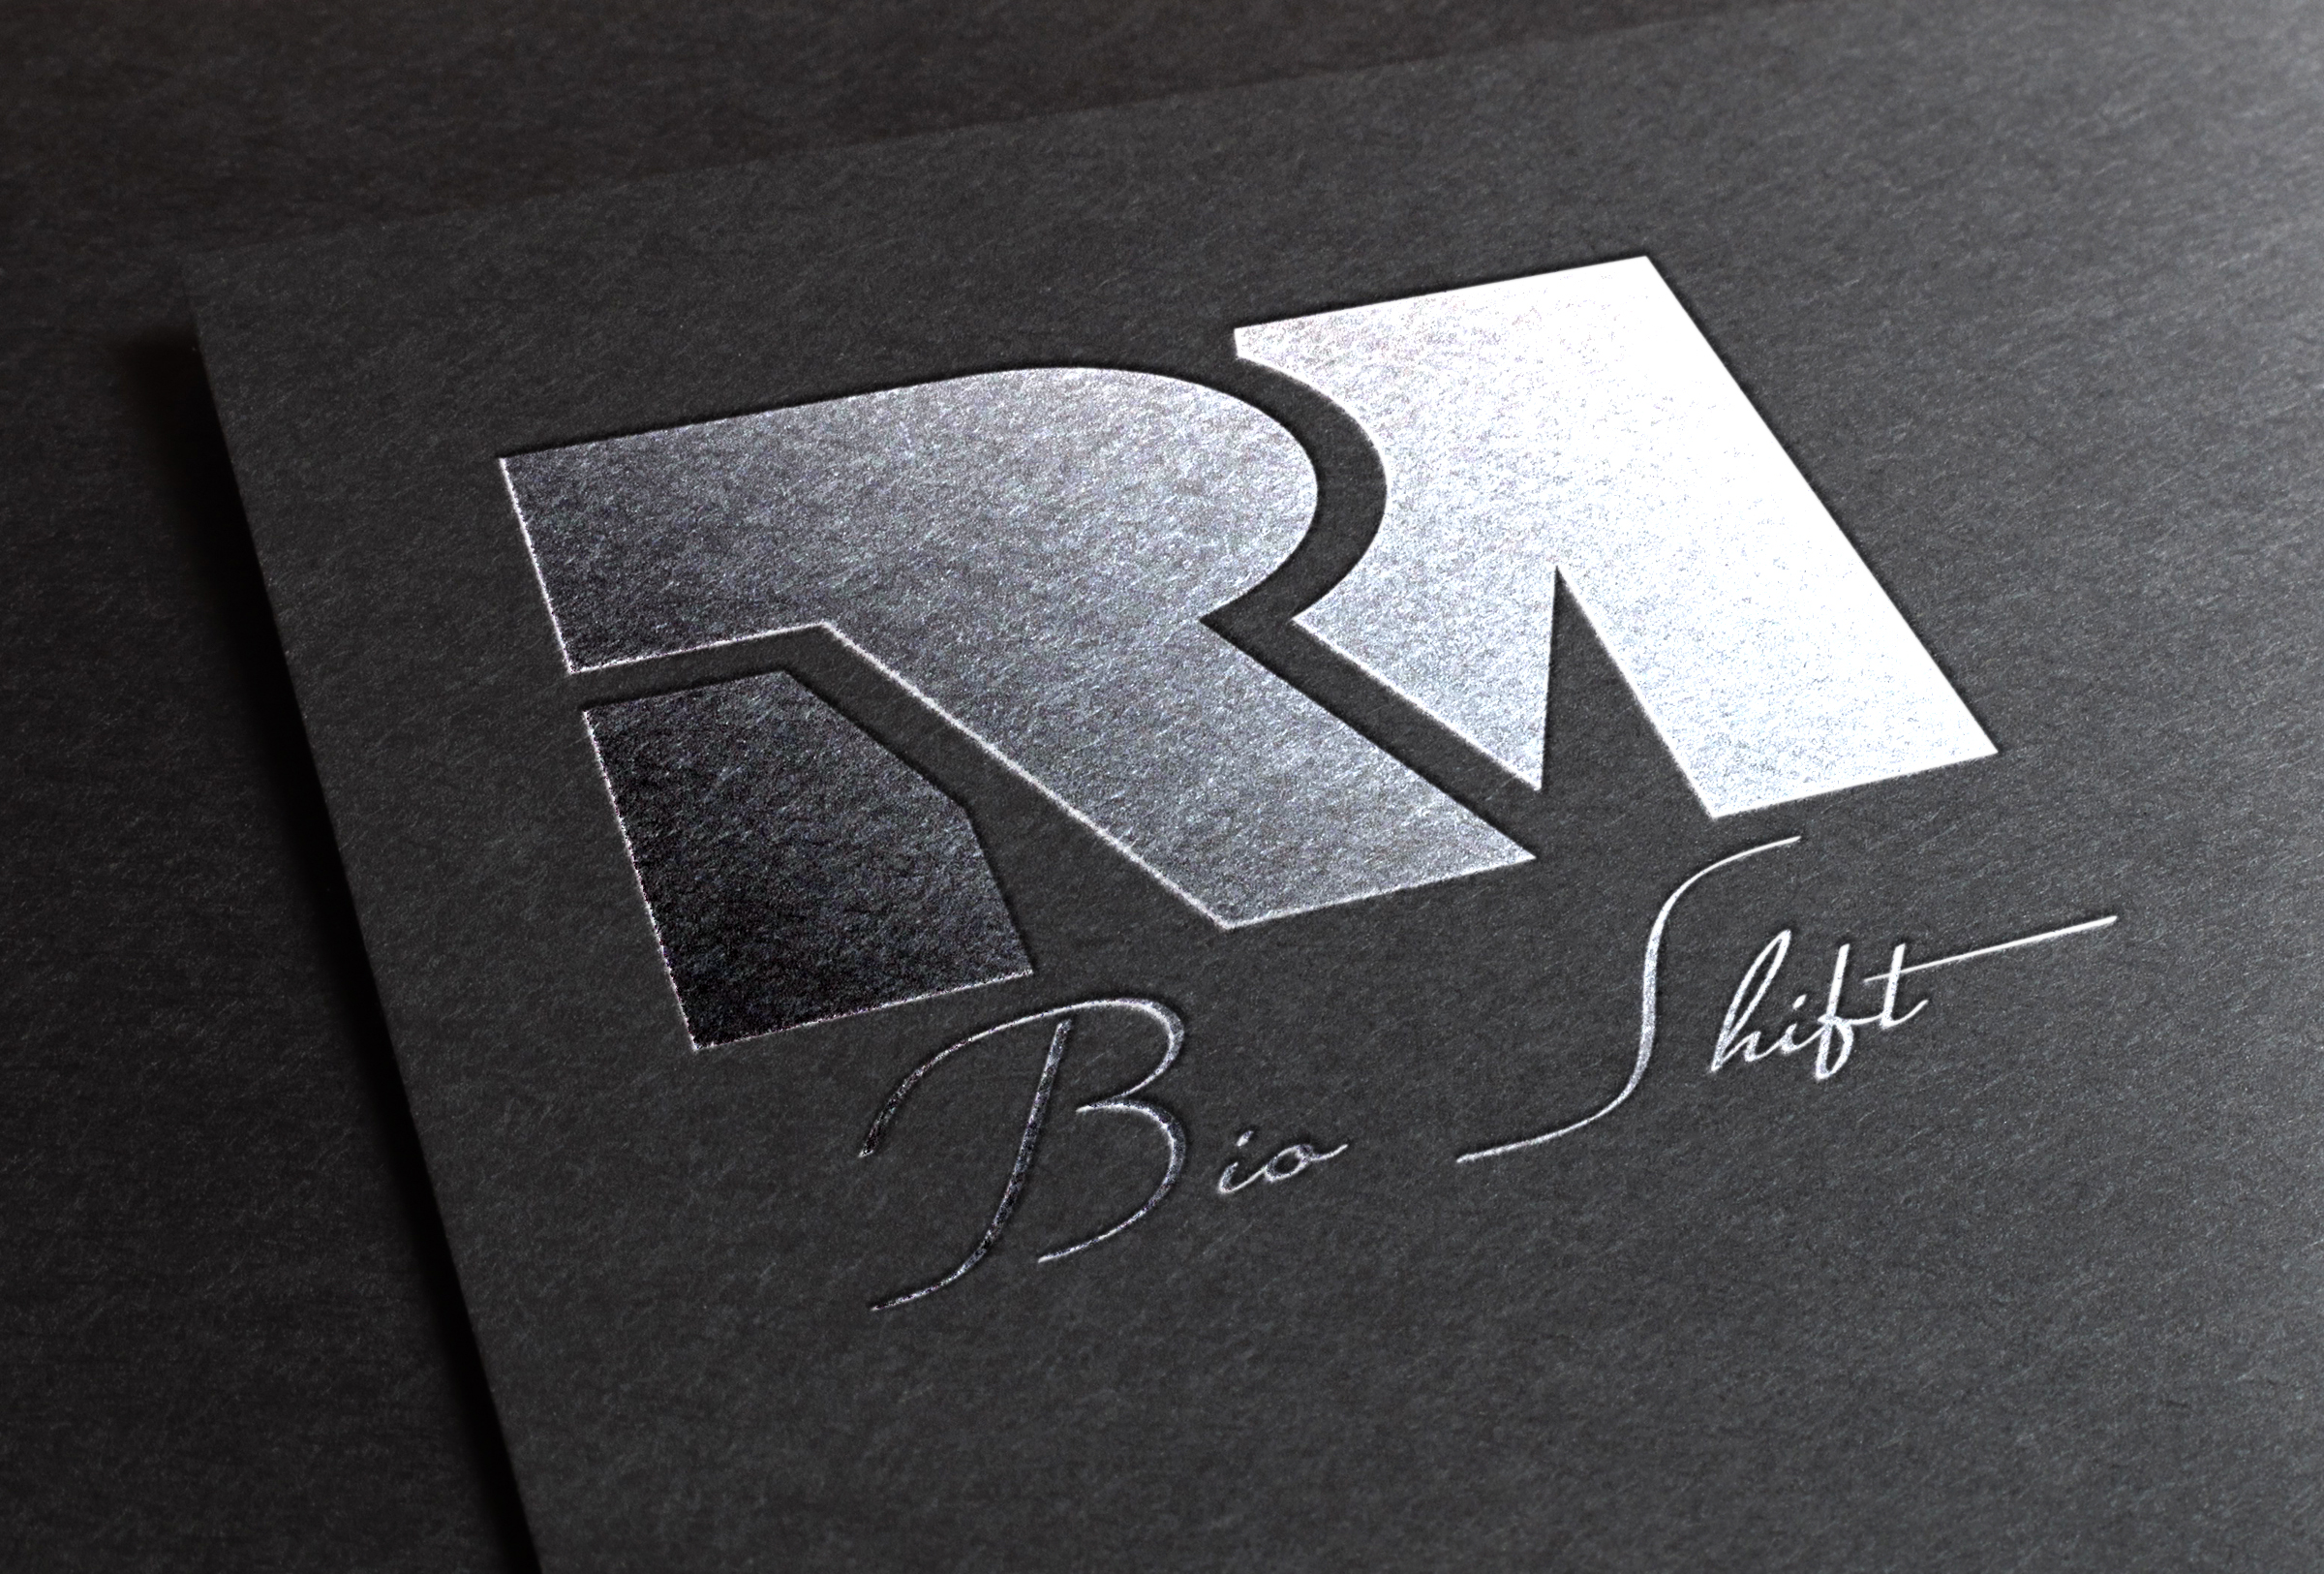 Rm Bio Shift